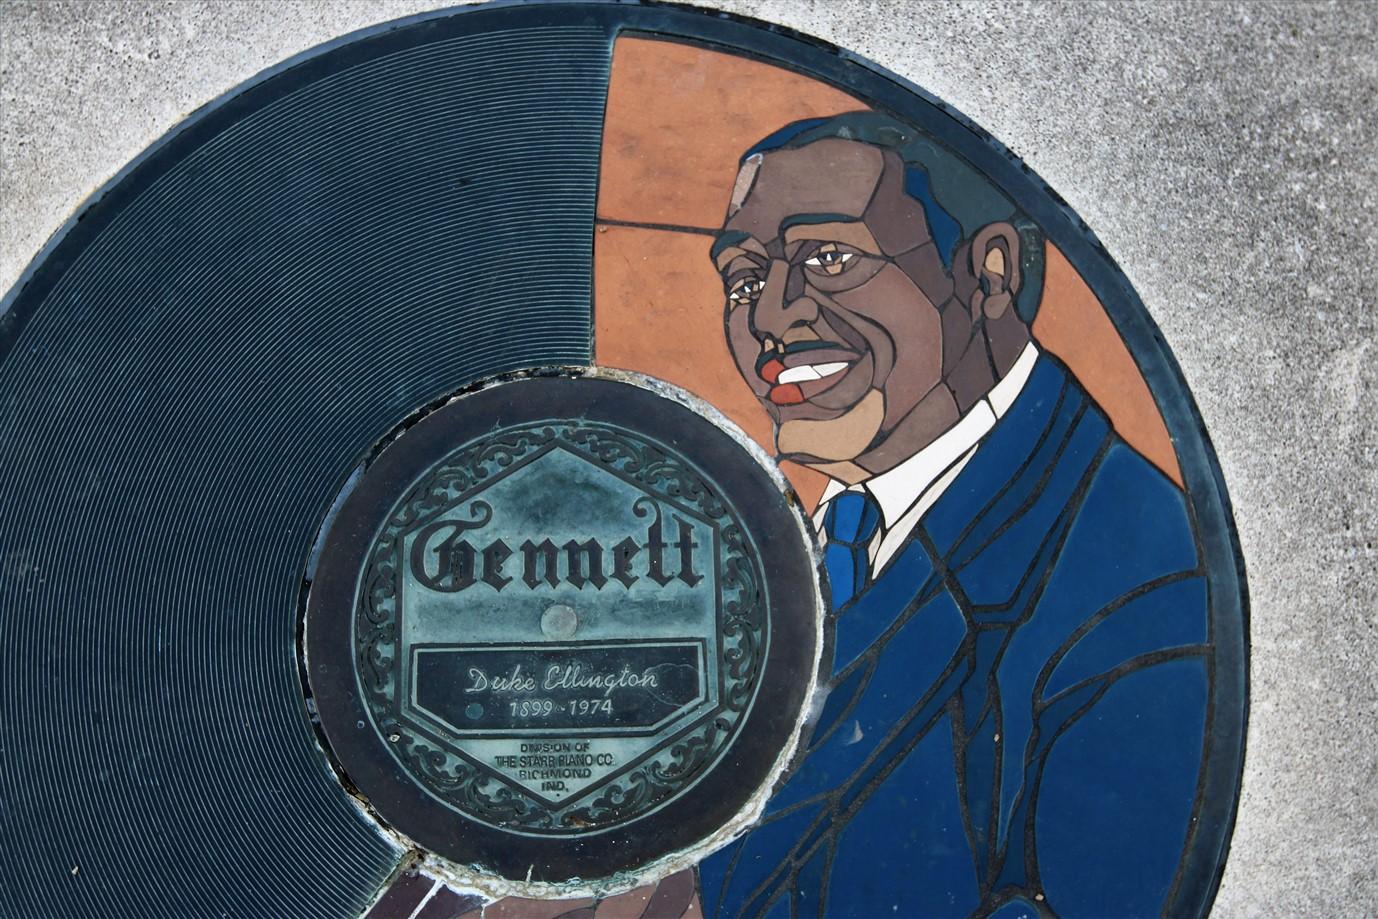 2018 07 17 426  Richmond IN Gennett Records Walk of Fame.jpg